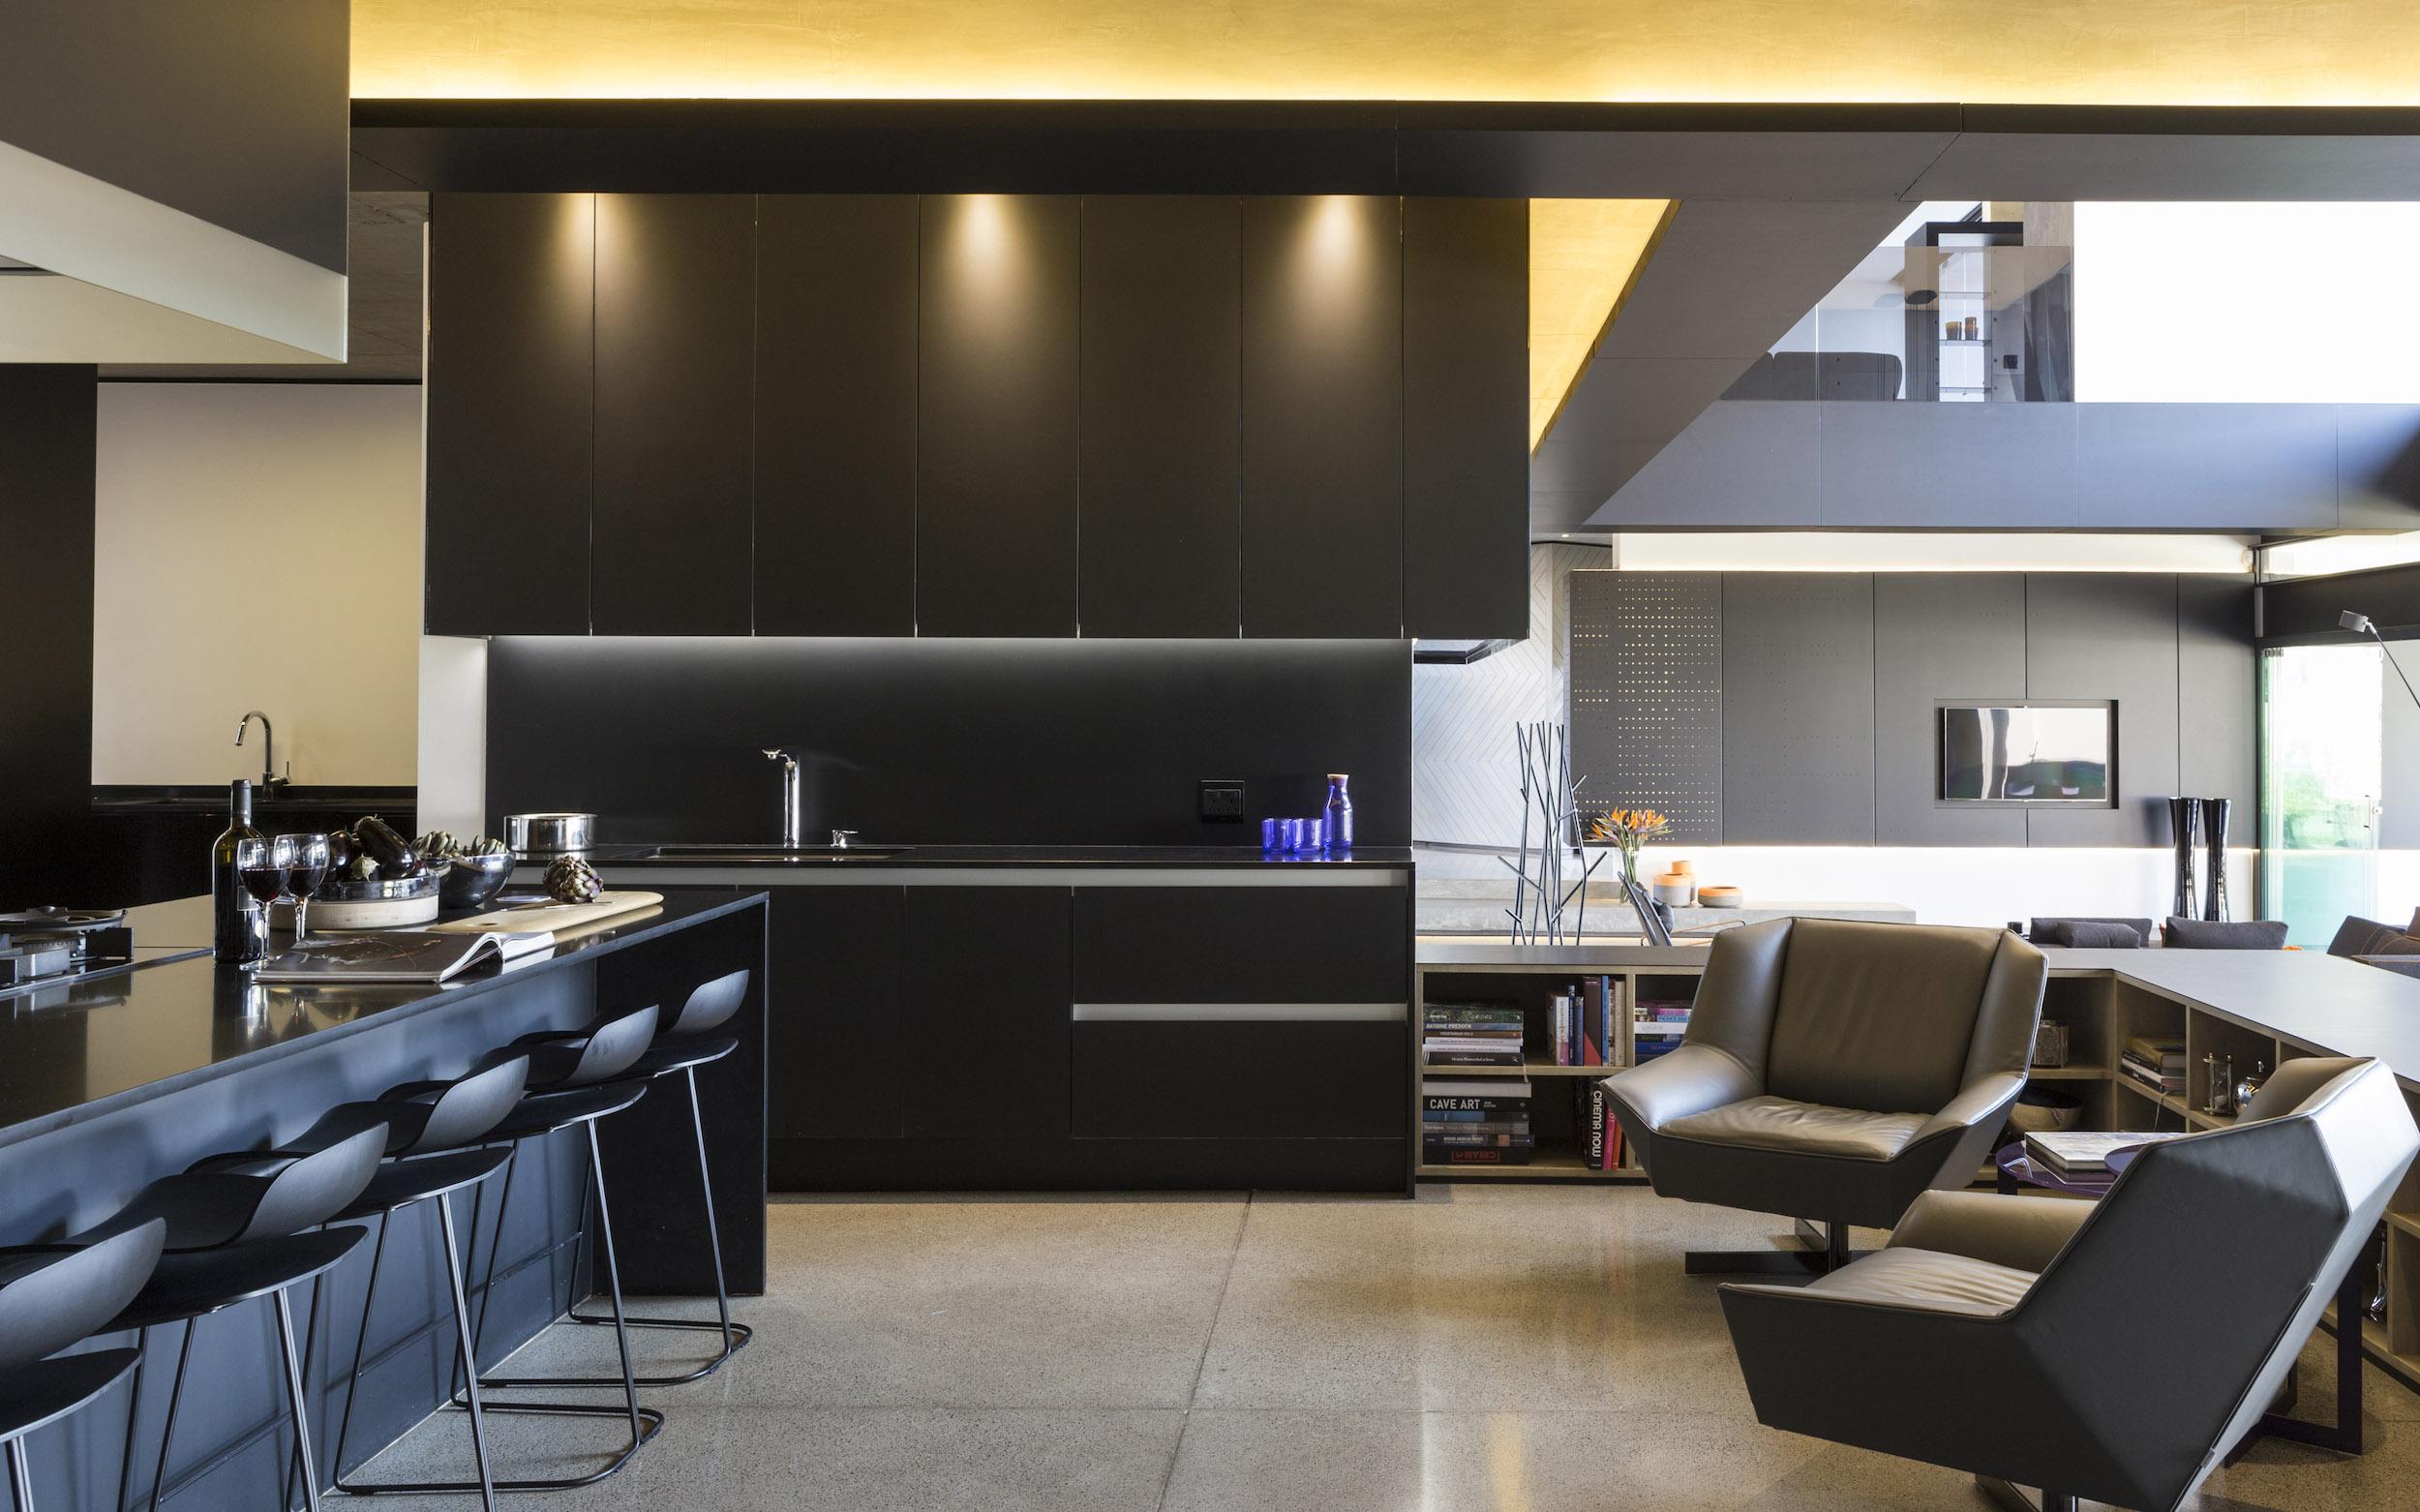 Kloof Road Masterpiece House in Johannesburg by Nico van der Meulen Architects-29